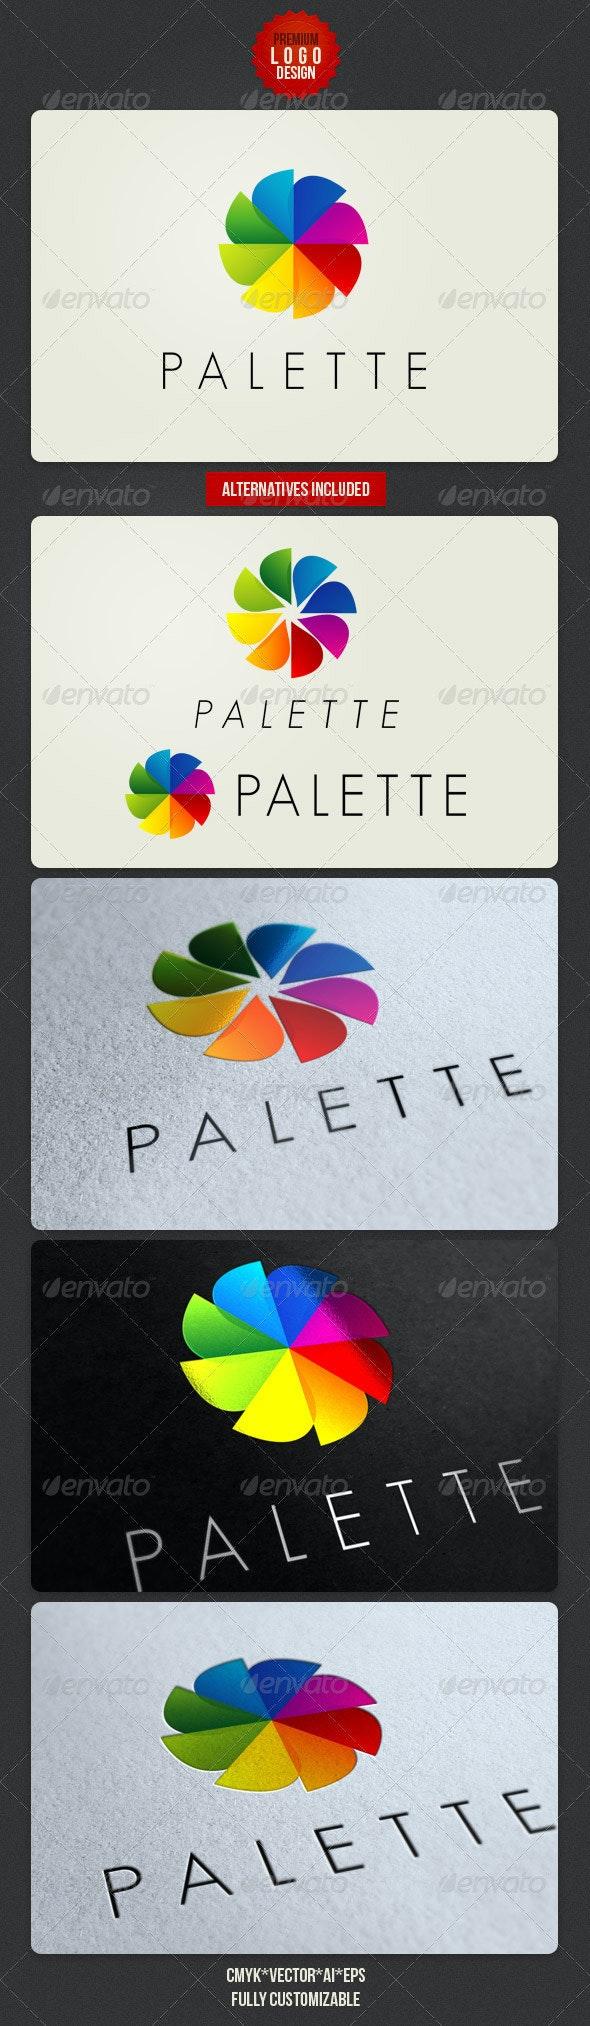 Palette Clean Logo Design - Symbols Logo Templates